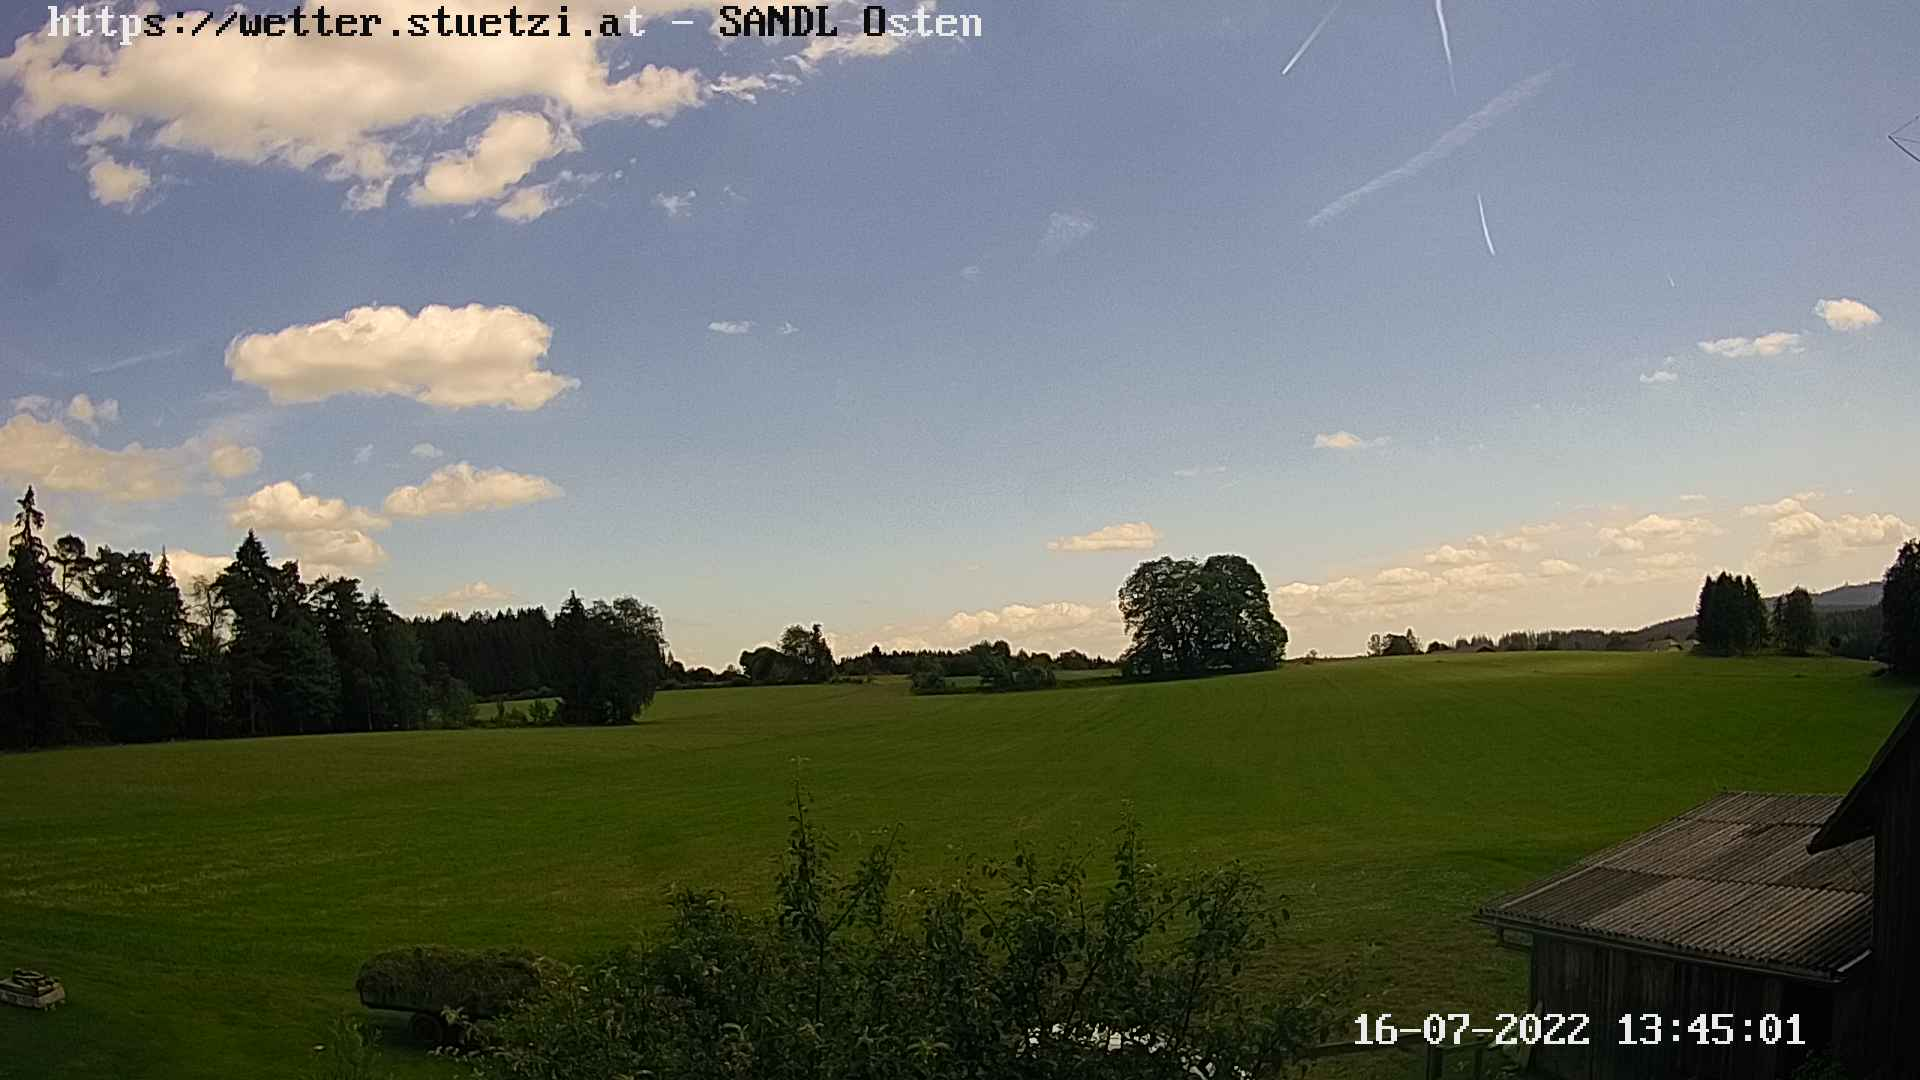 Stuetzi - Rindlberg Ost